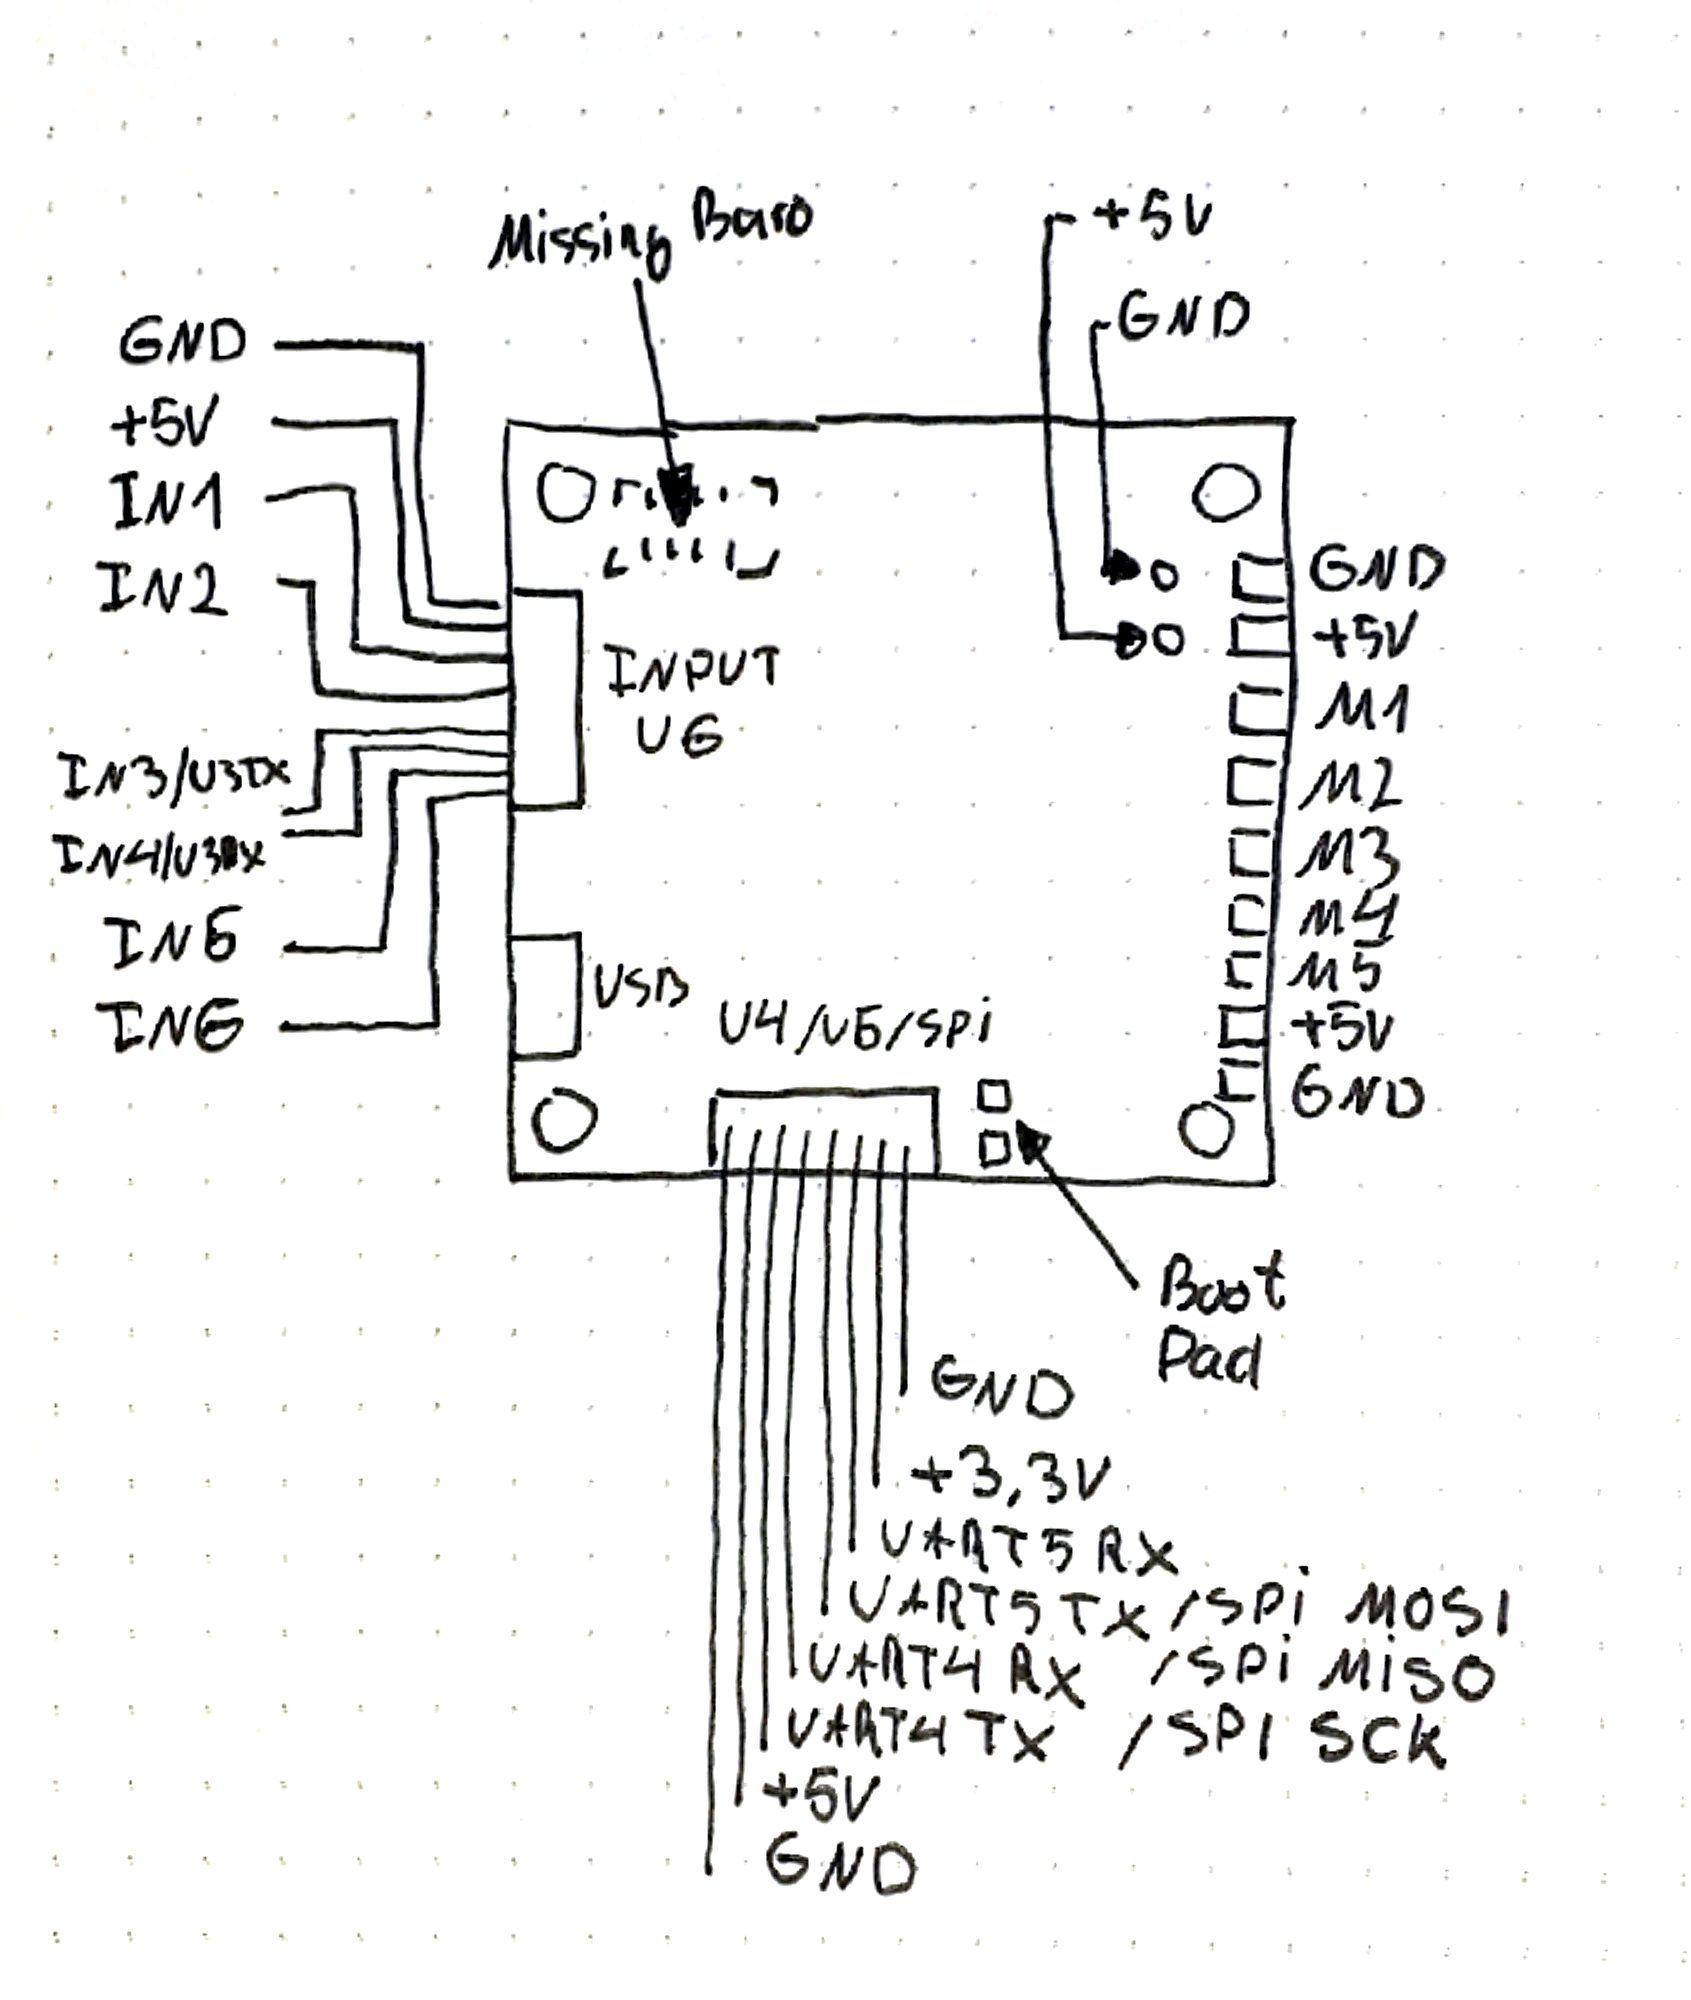 pin by felix vatamanu on drones in 2018 pinterest diagram wire  [ 1691 x 2000 Pixel ]